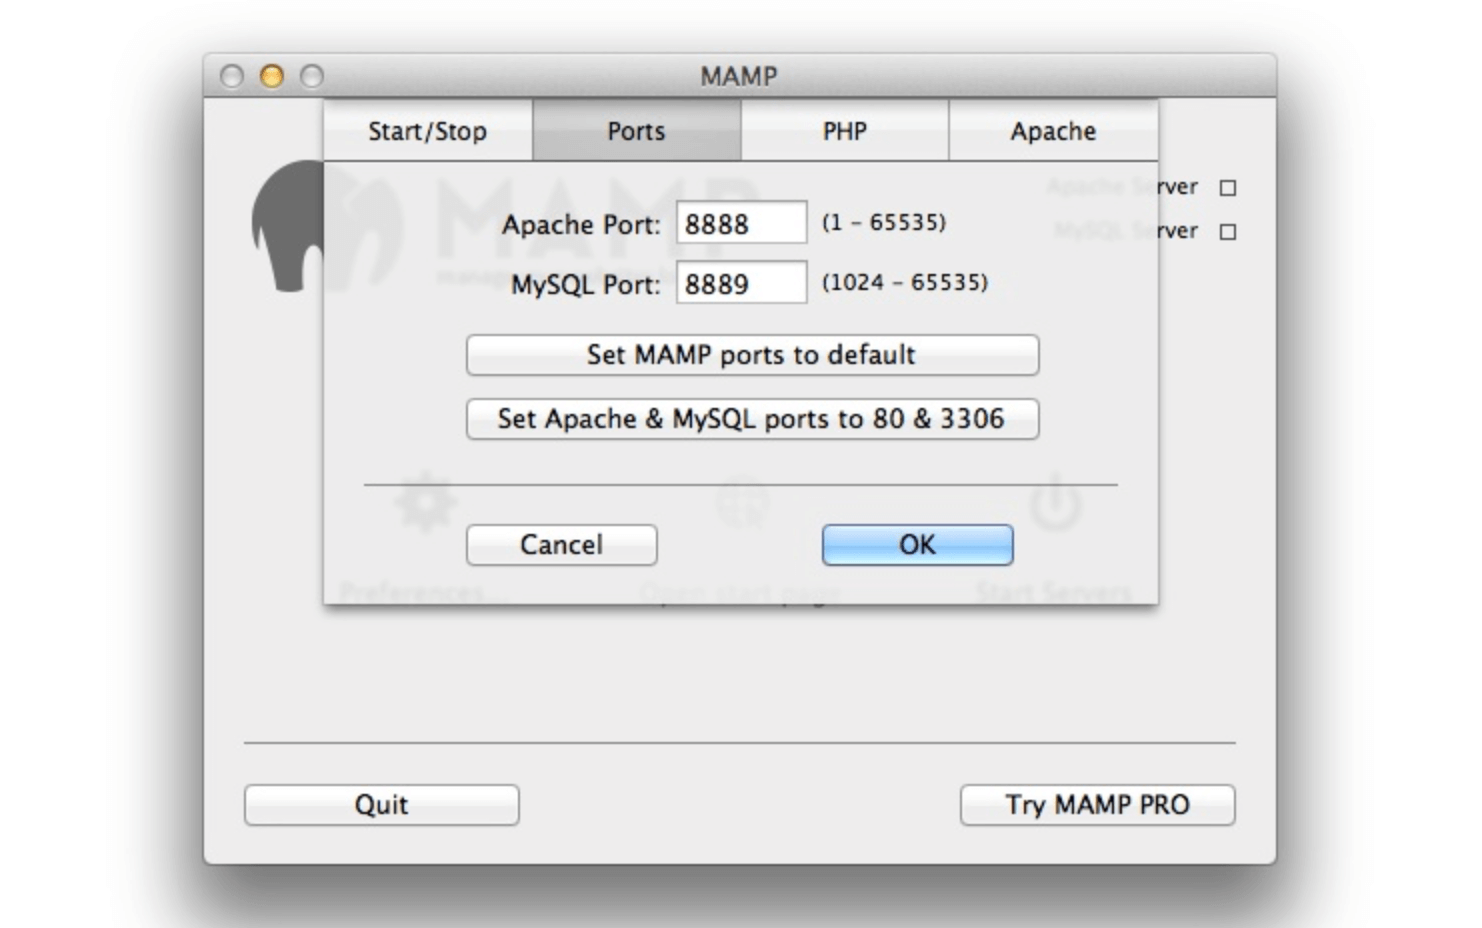 MAMP's default port settings.